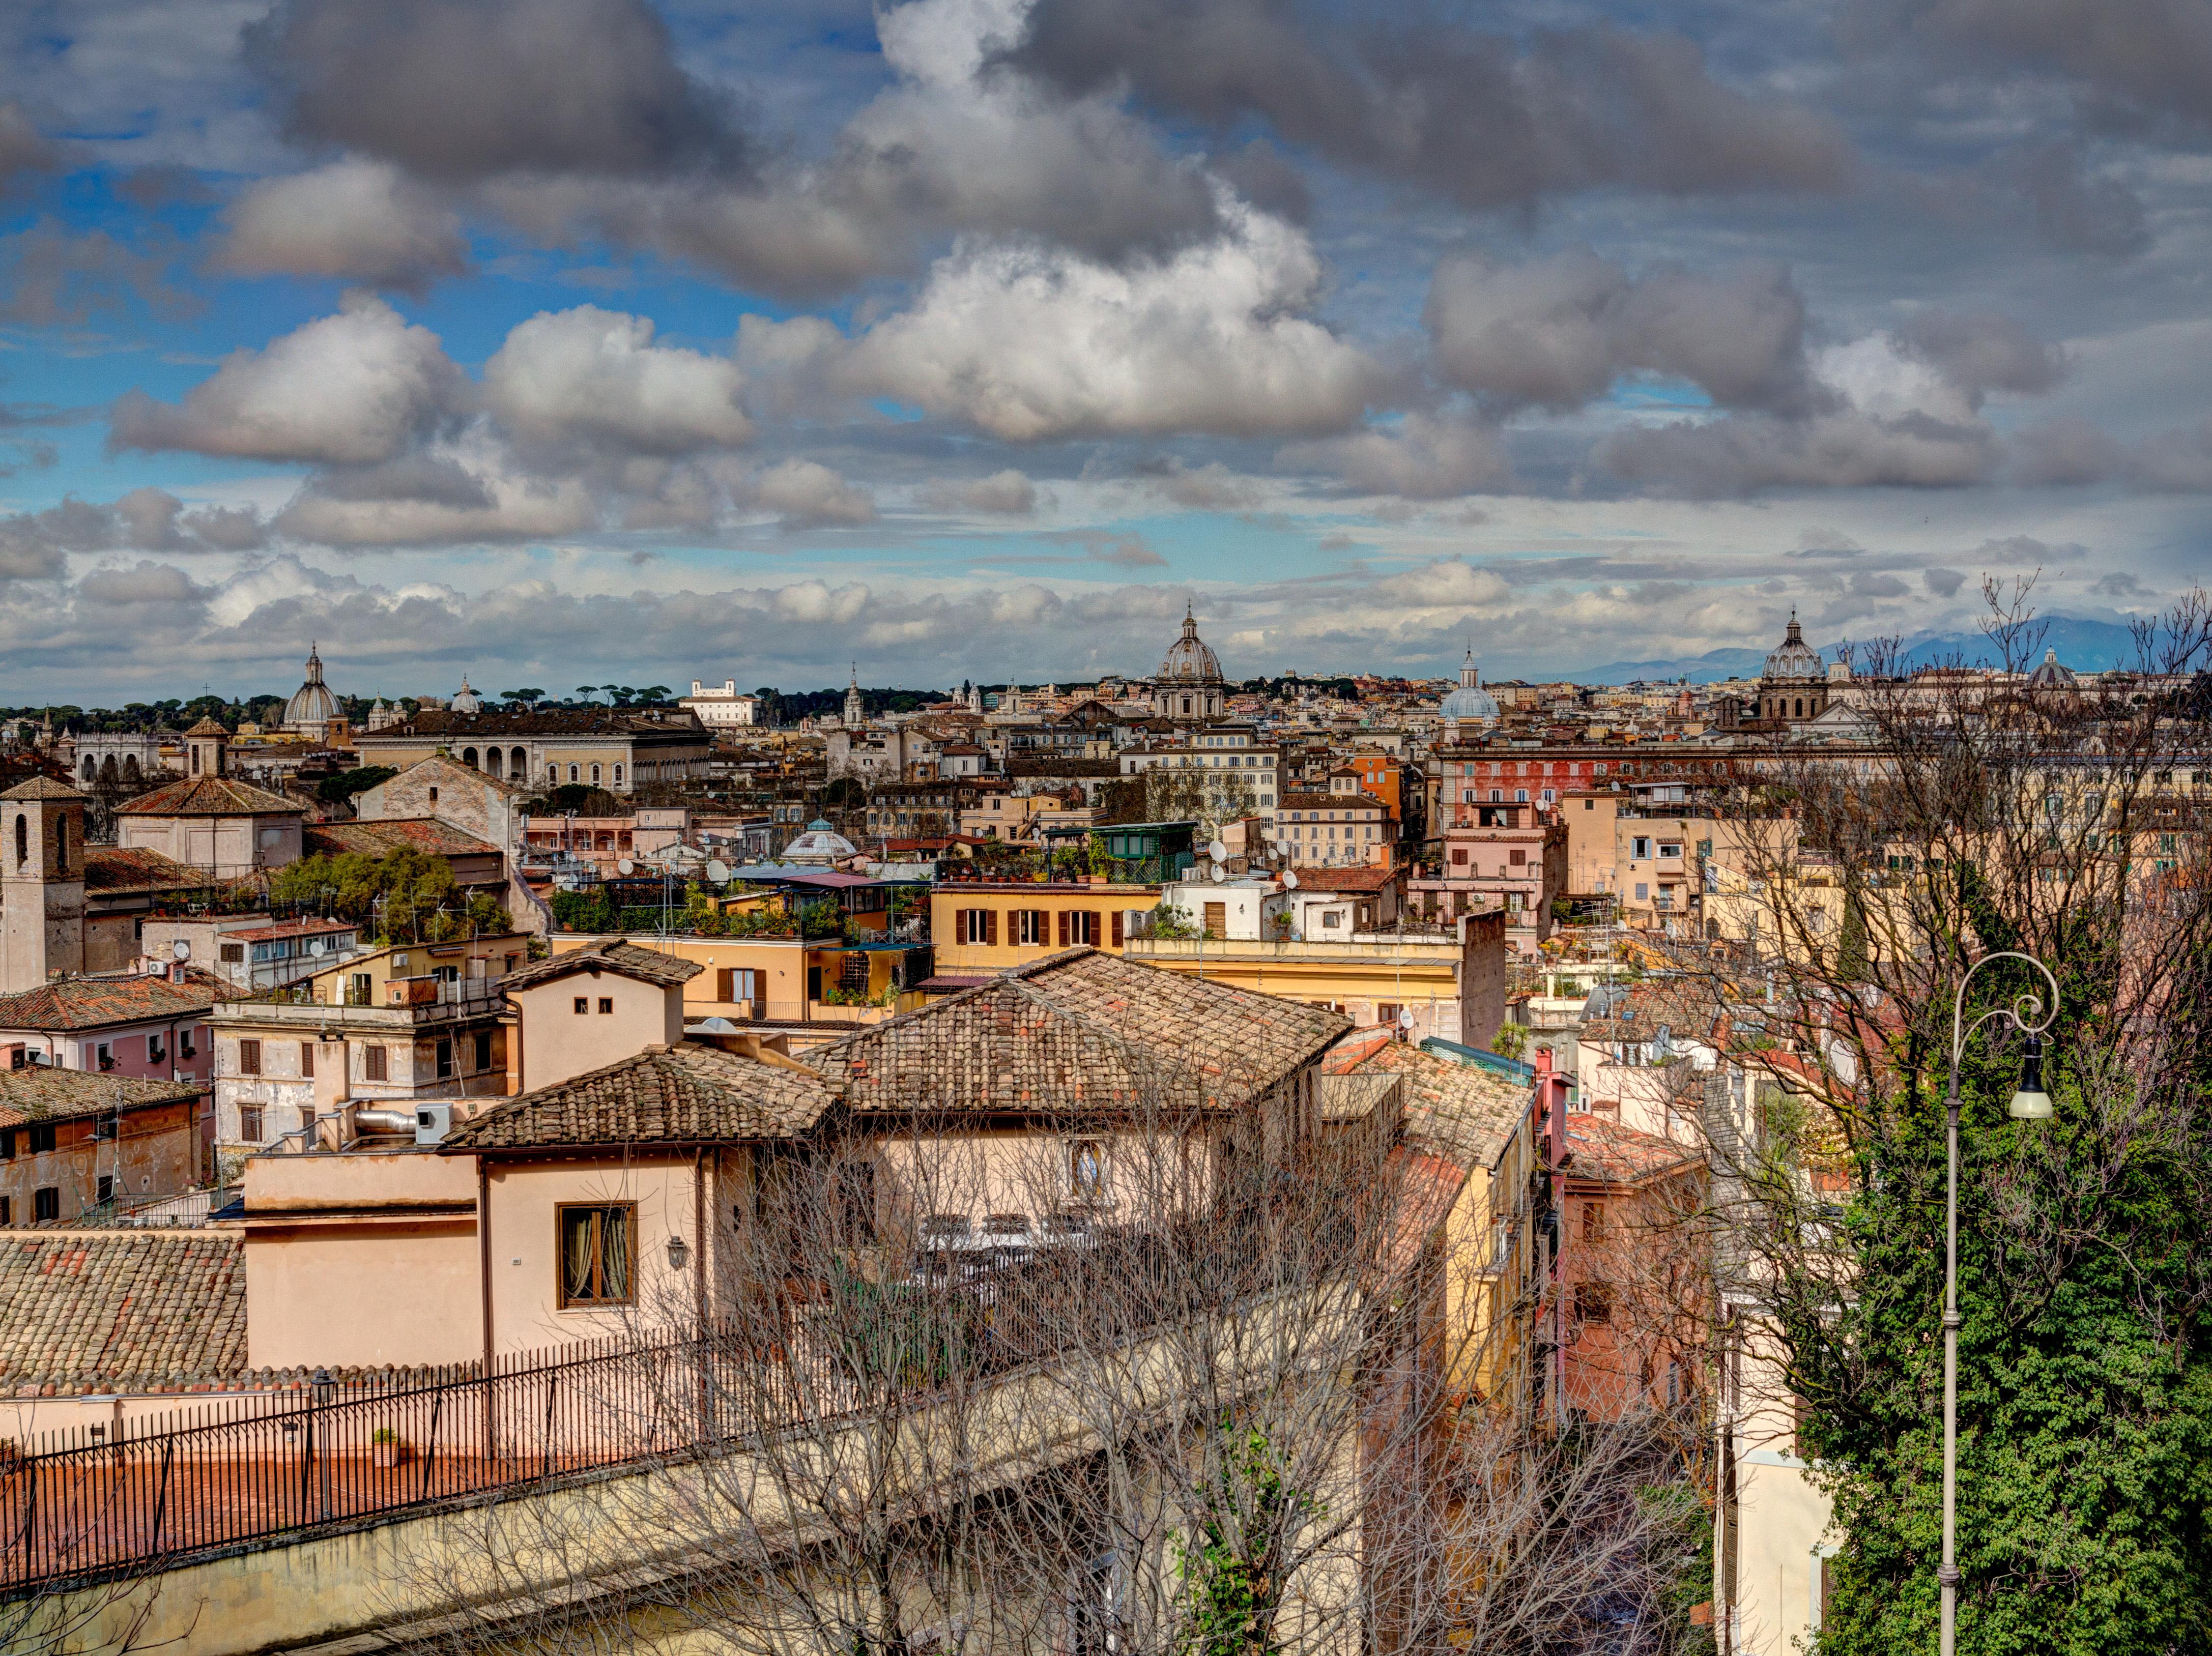 File Trastevere Roma Via Garibaldi 2013 03 Jpg Wikimedia